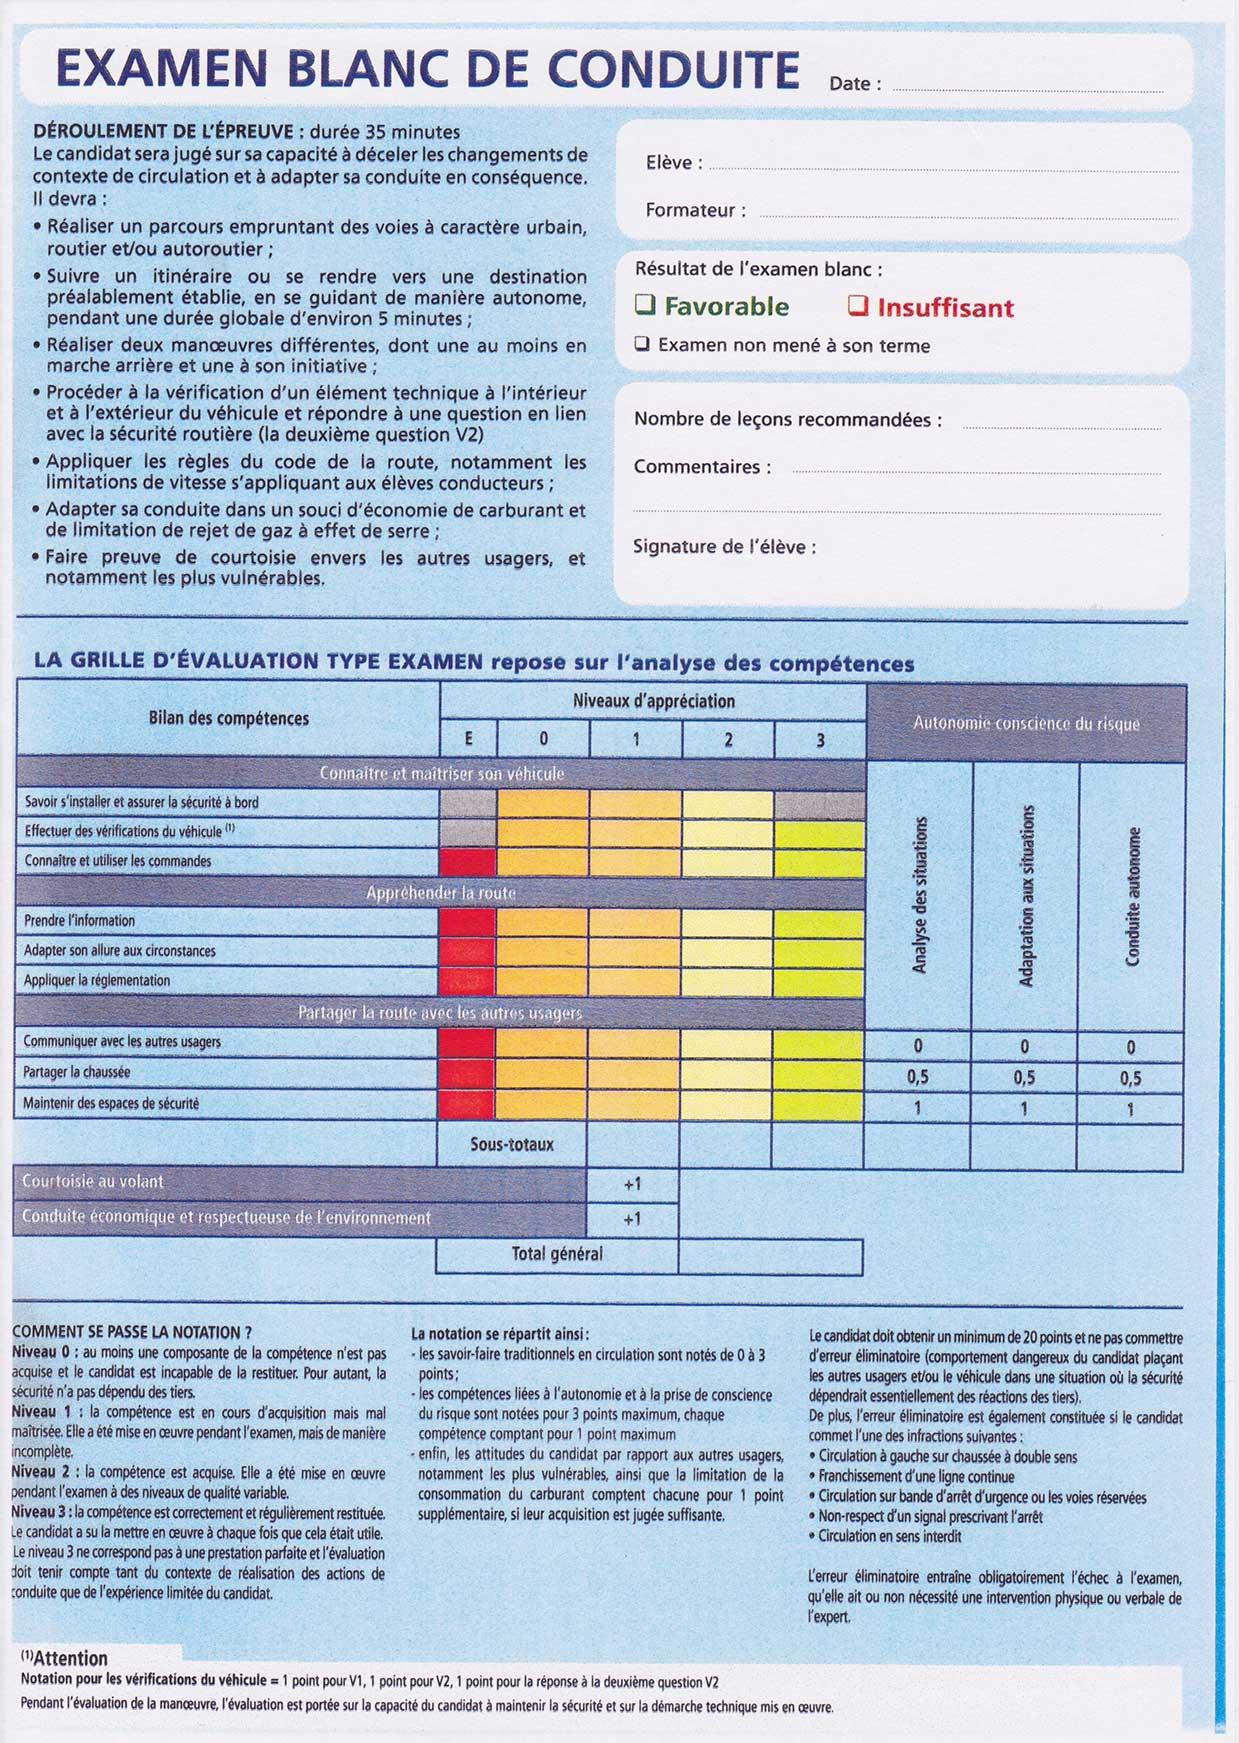 Permis b louvern conduite auto ecole louvern 53950 - Grille d evaluation permis de conduire ...